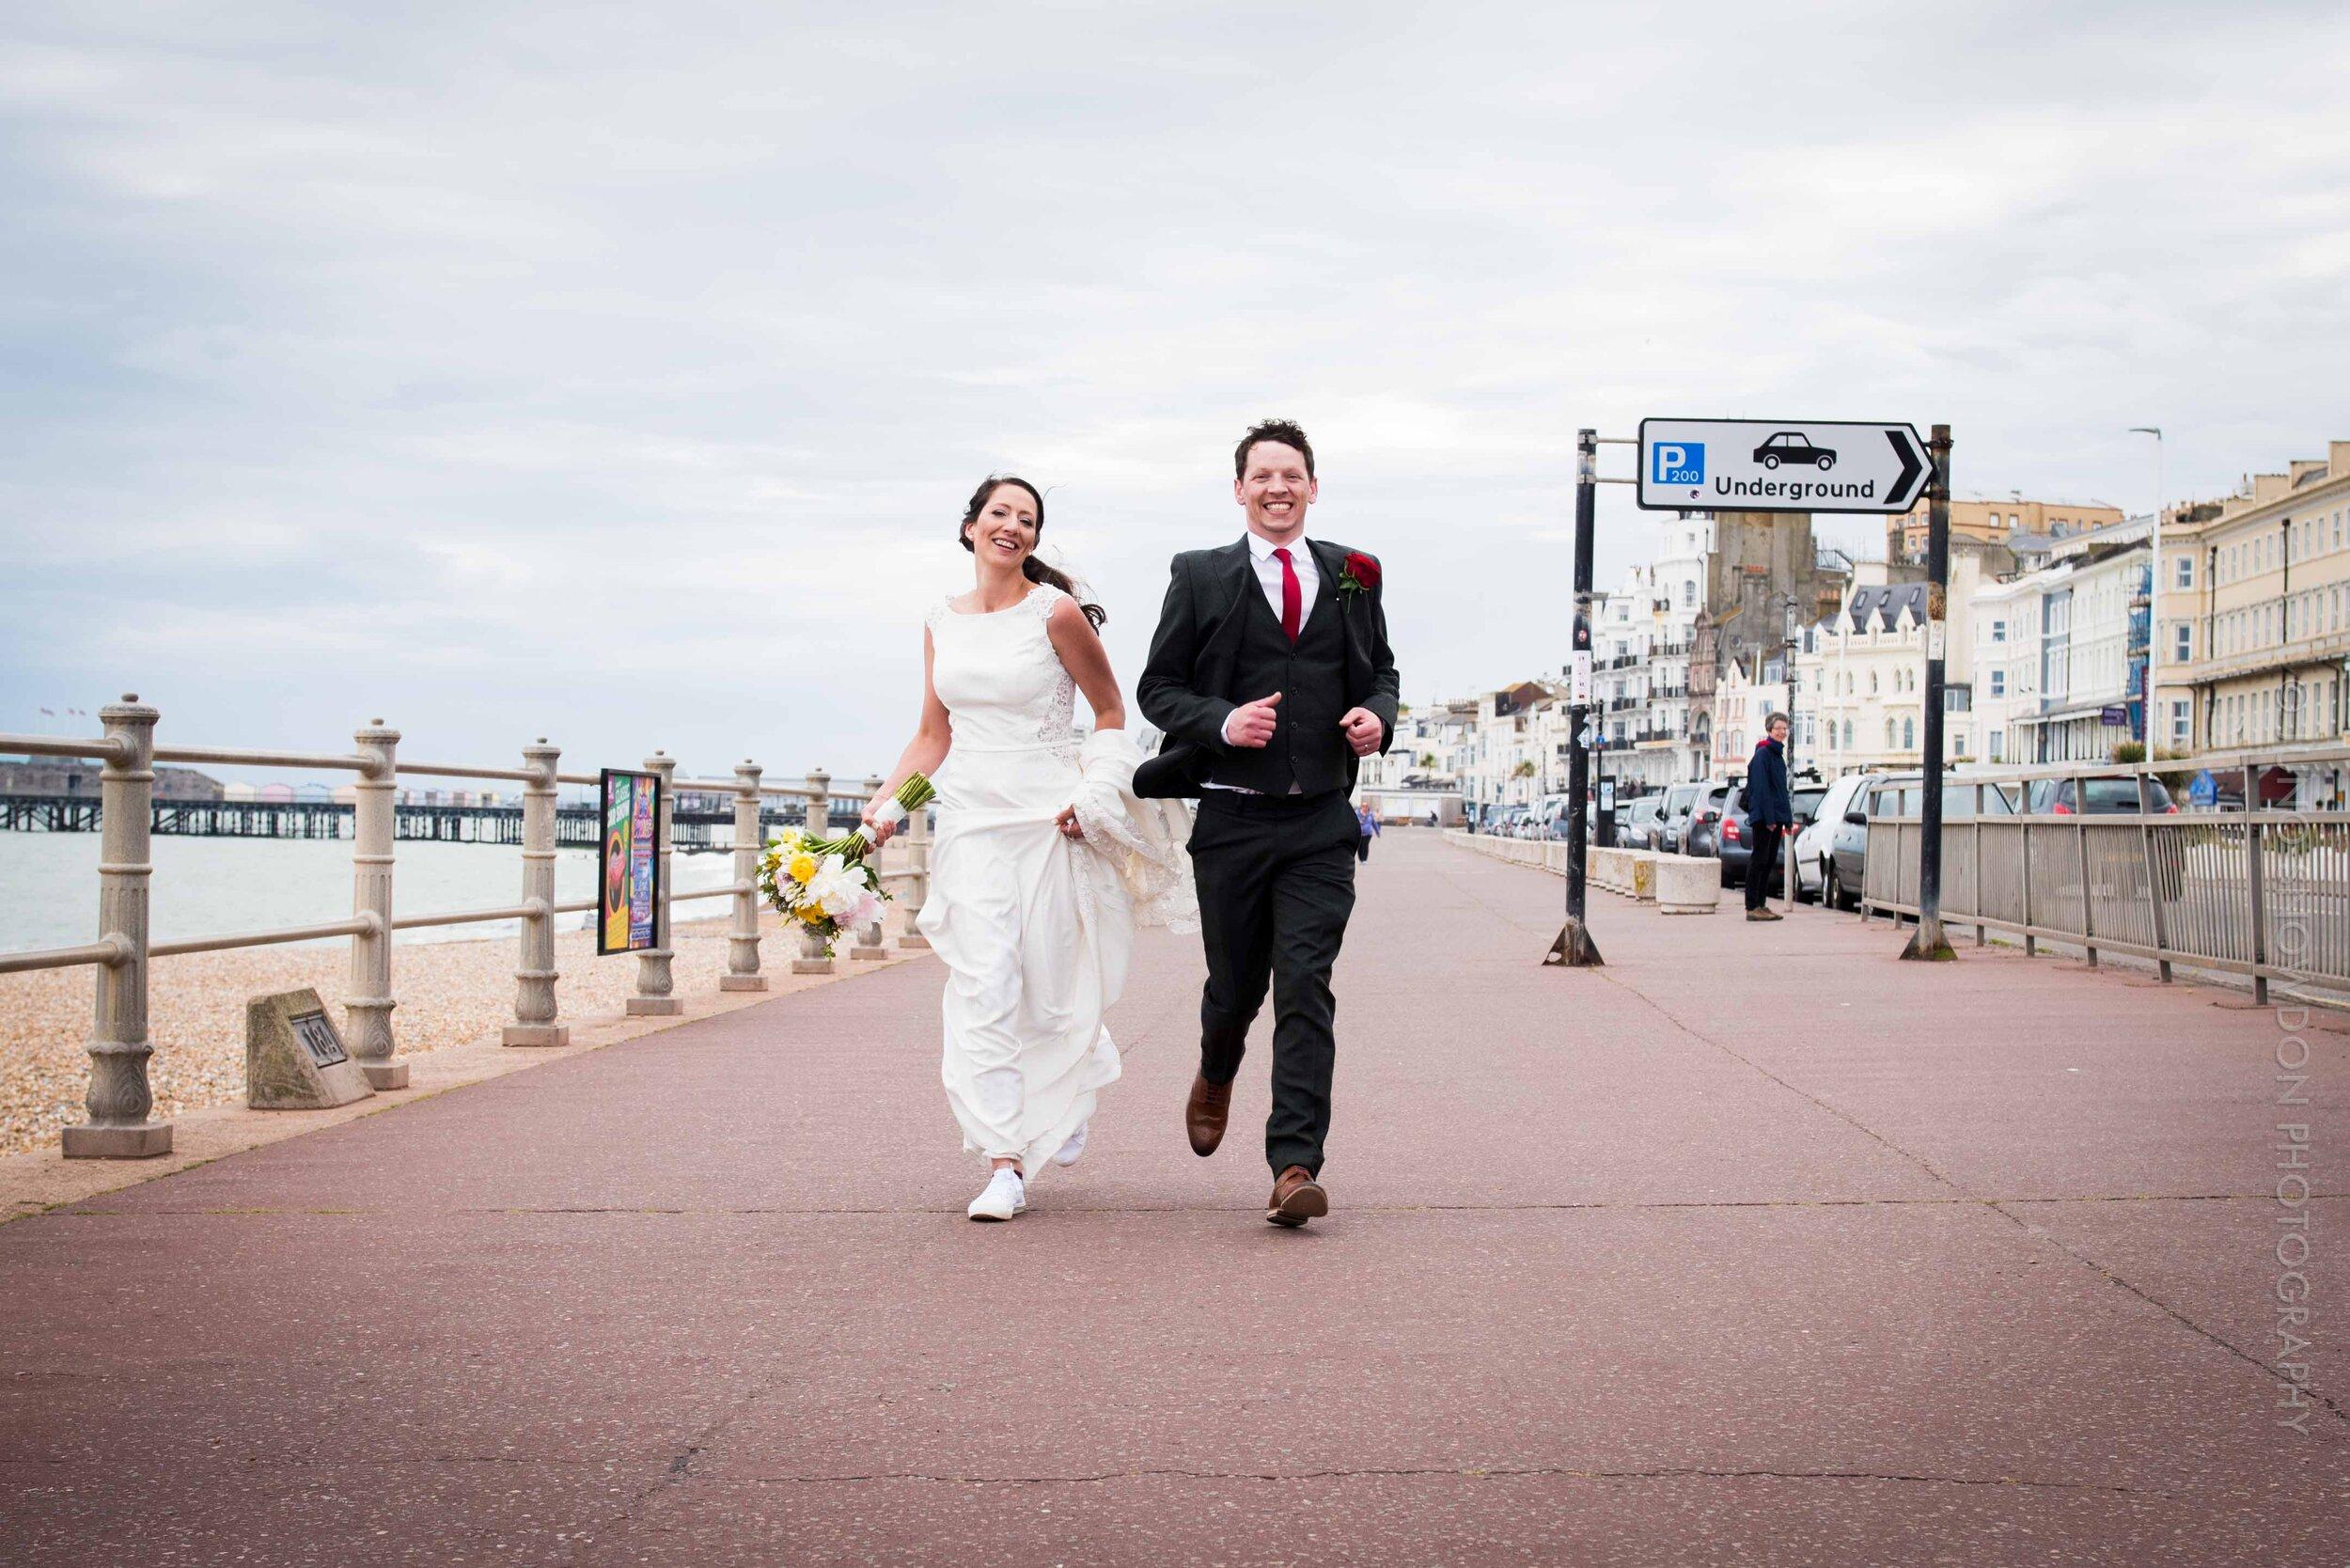 juno-snowdon-photography-wedding-7776.jpg